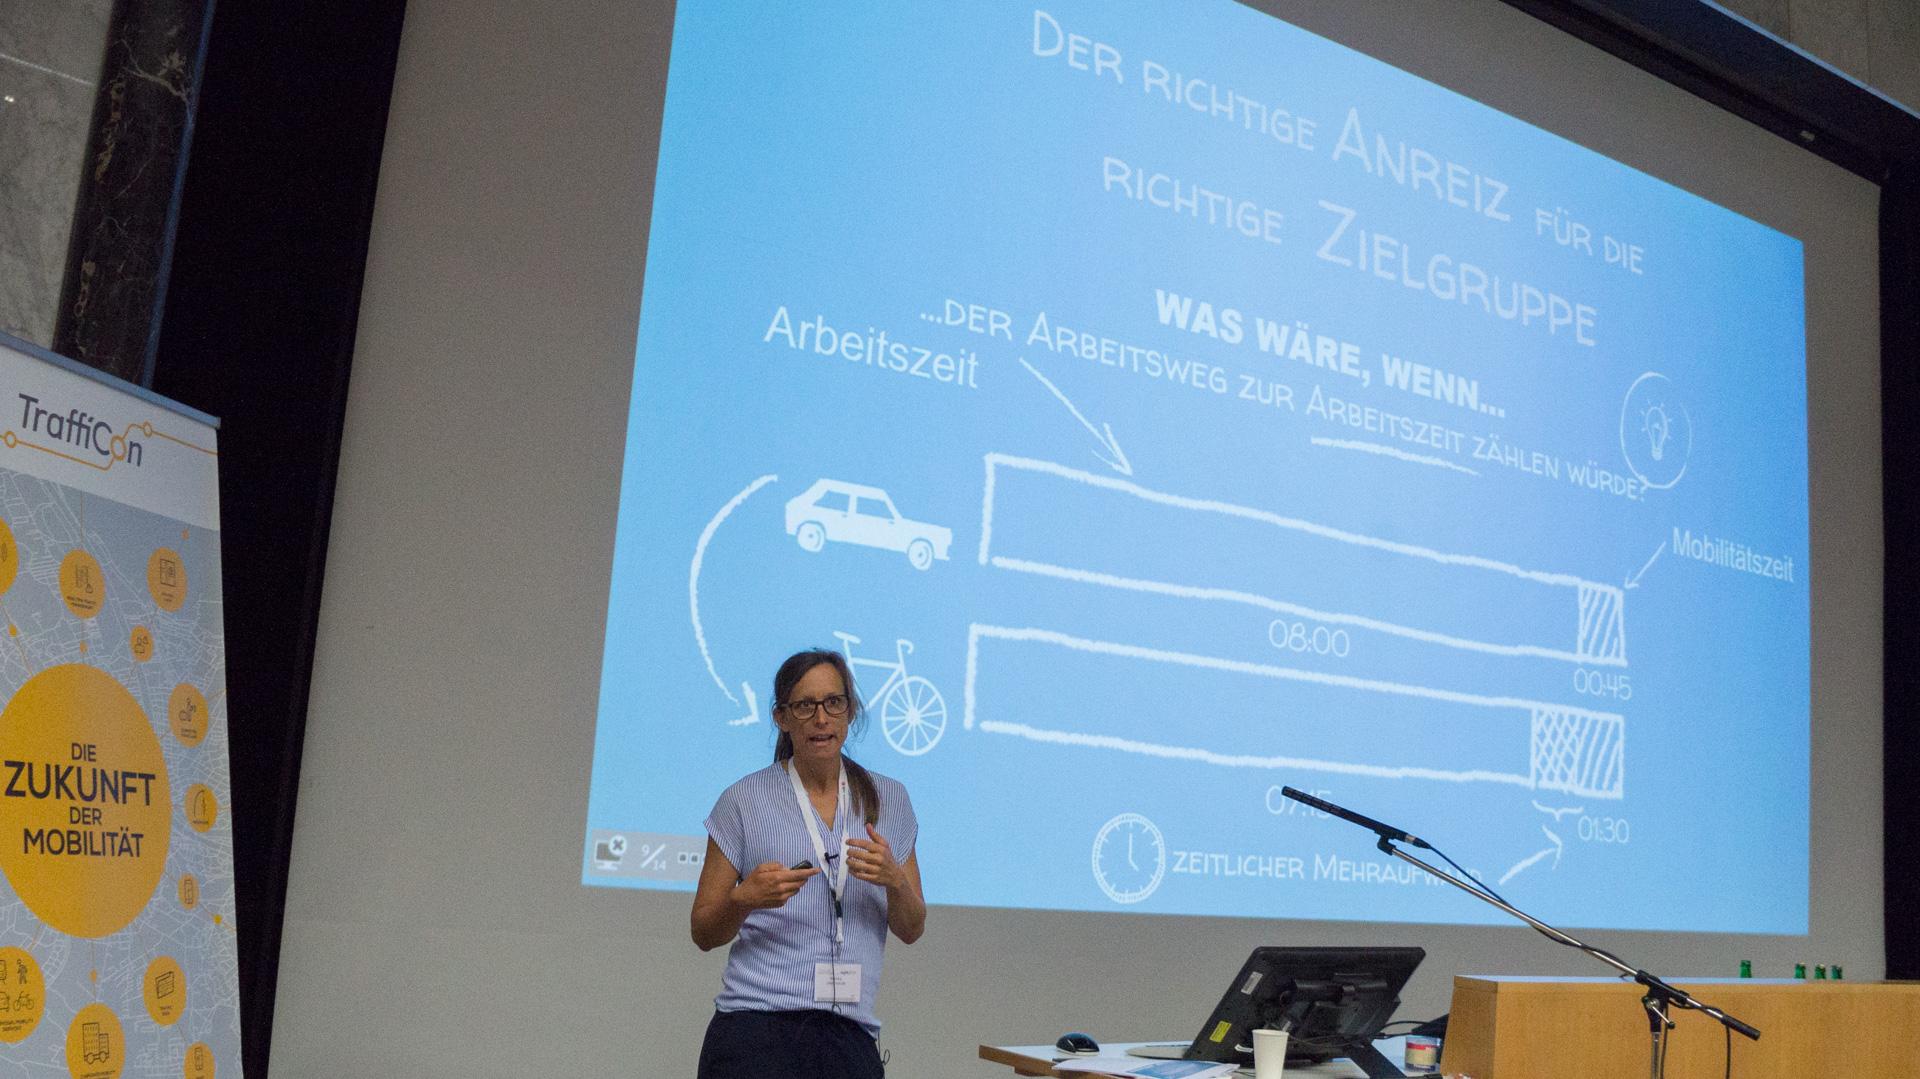 Wiebke-Unbehaun-Speaker-AGIT